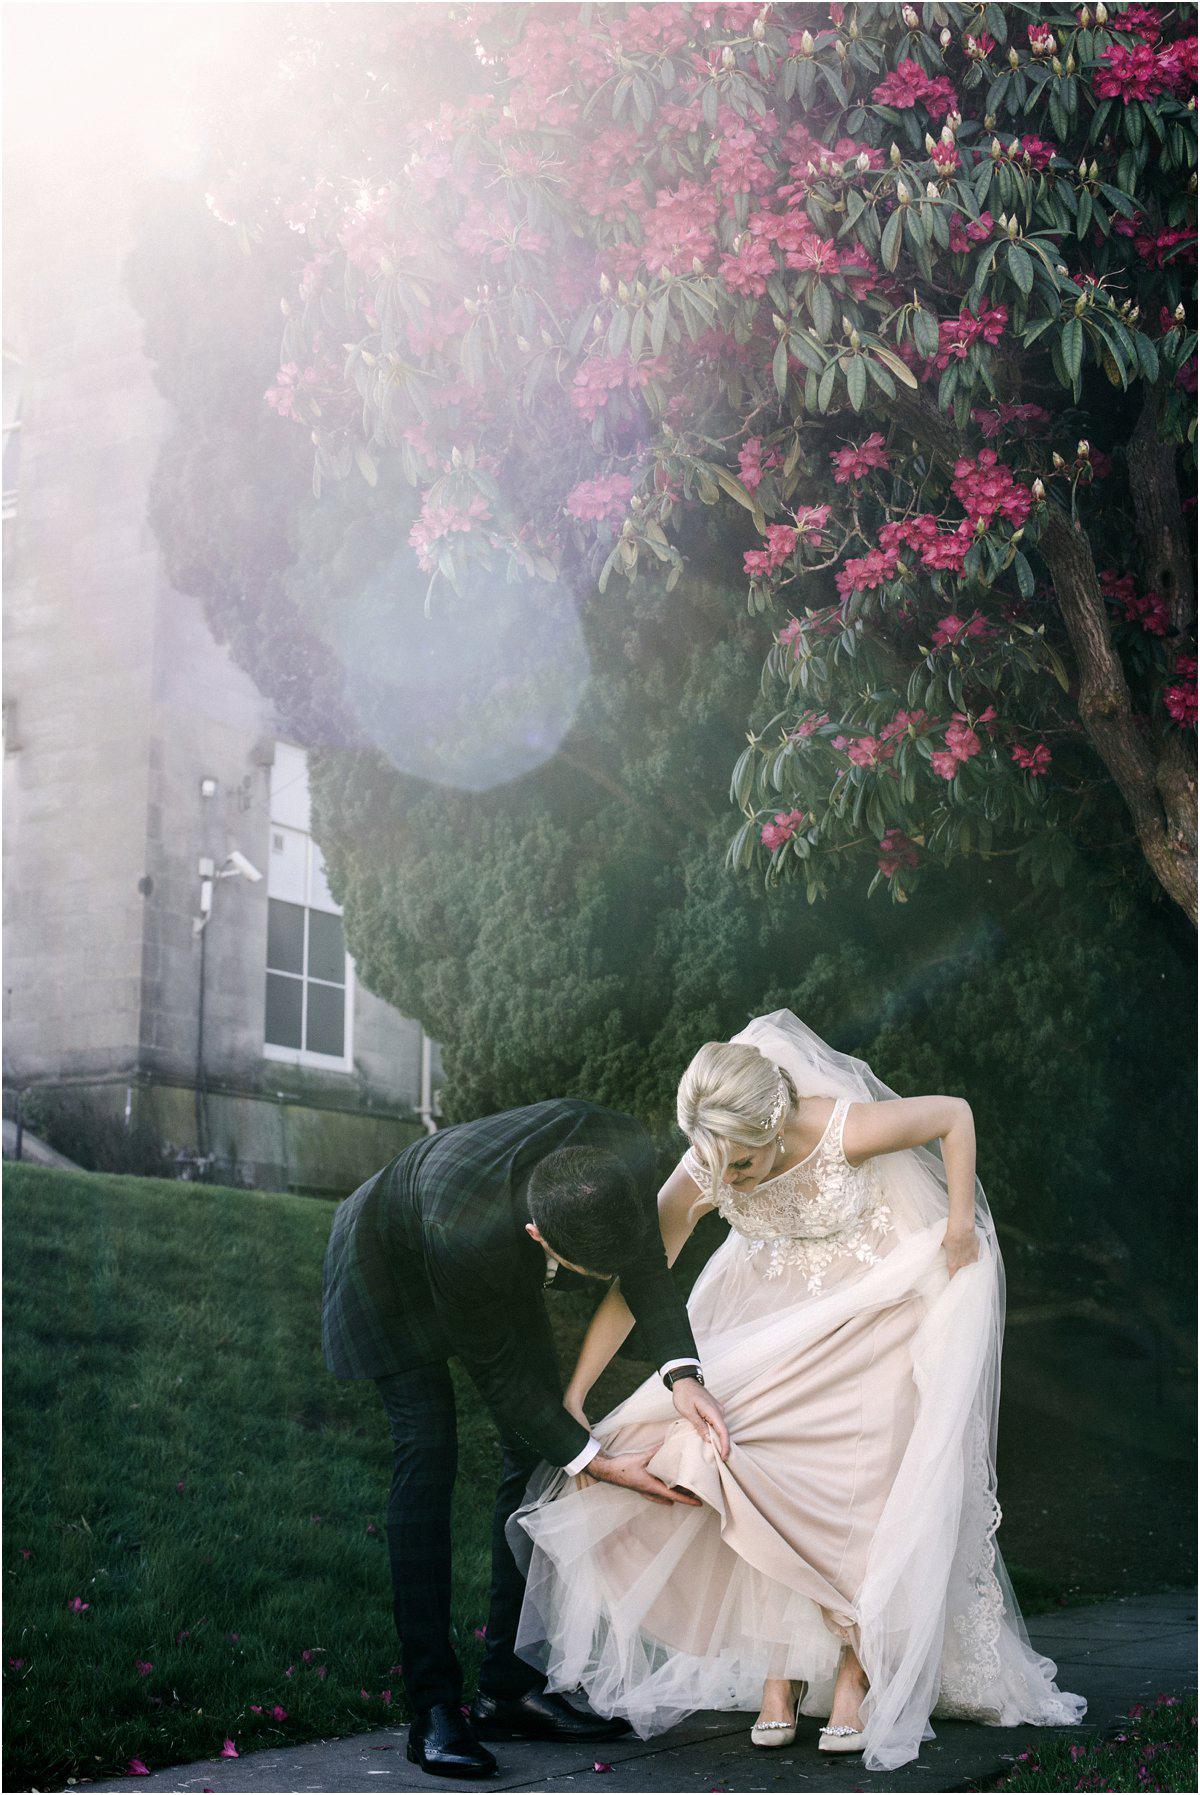 Crofts&Kowalczyk_DundasCastle_WeddingPhotography_Hannah&Tom-69.jpg